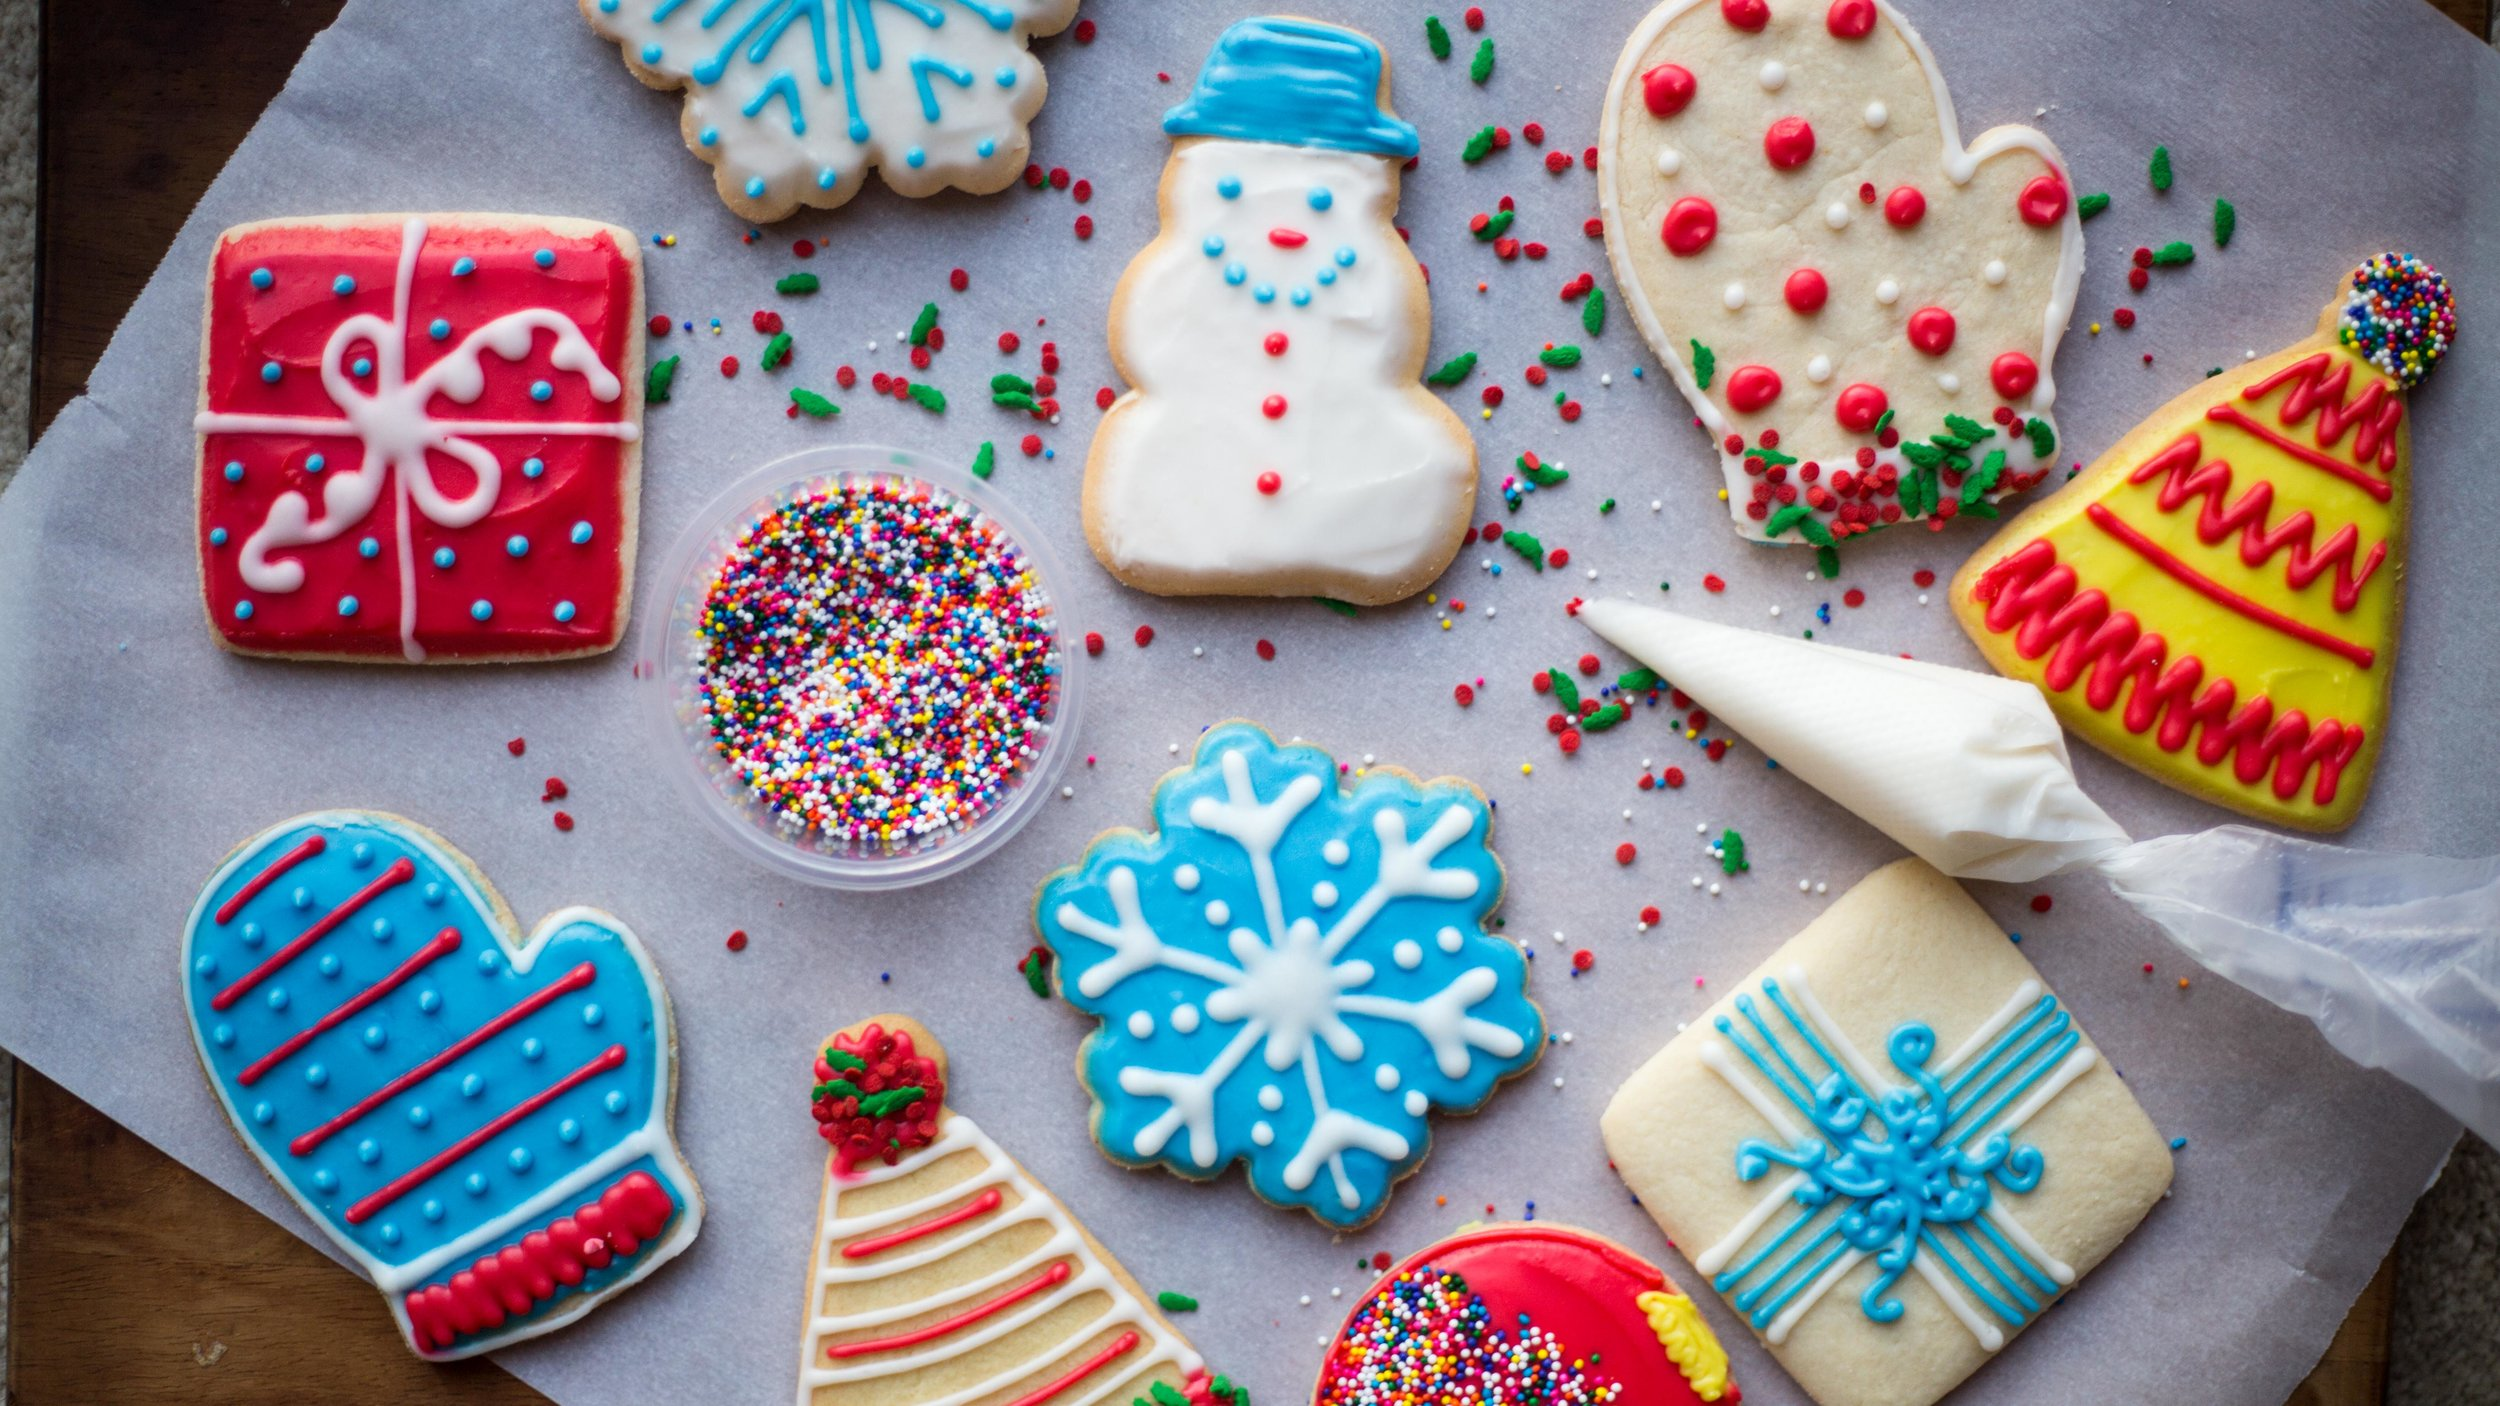 Cookie Party Kit _16x9_5472.jpg